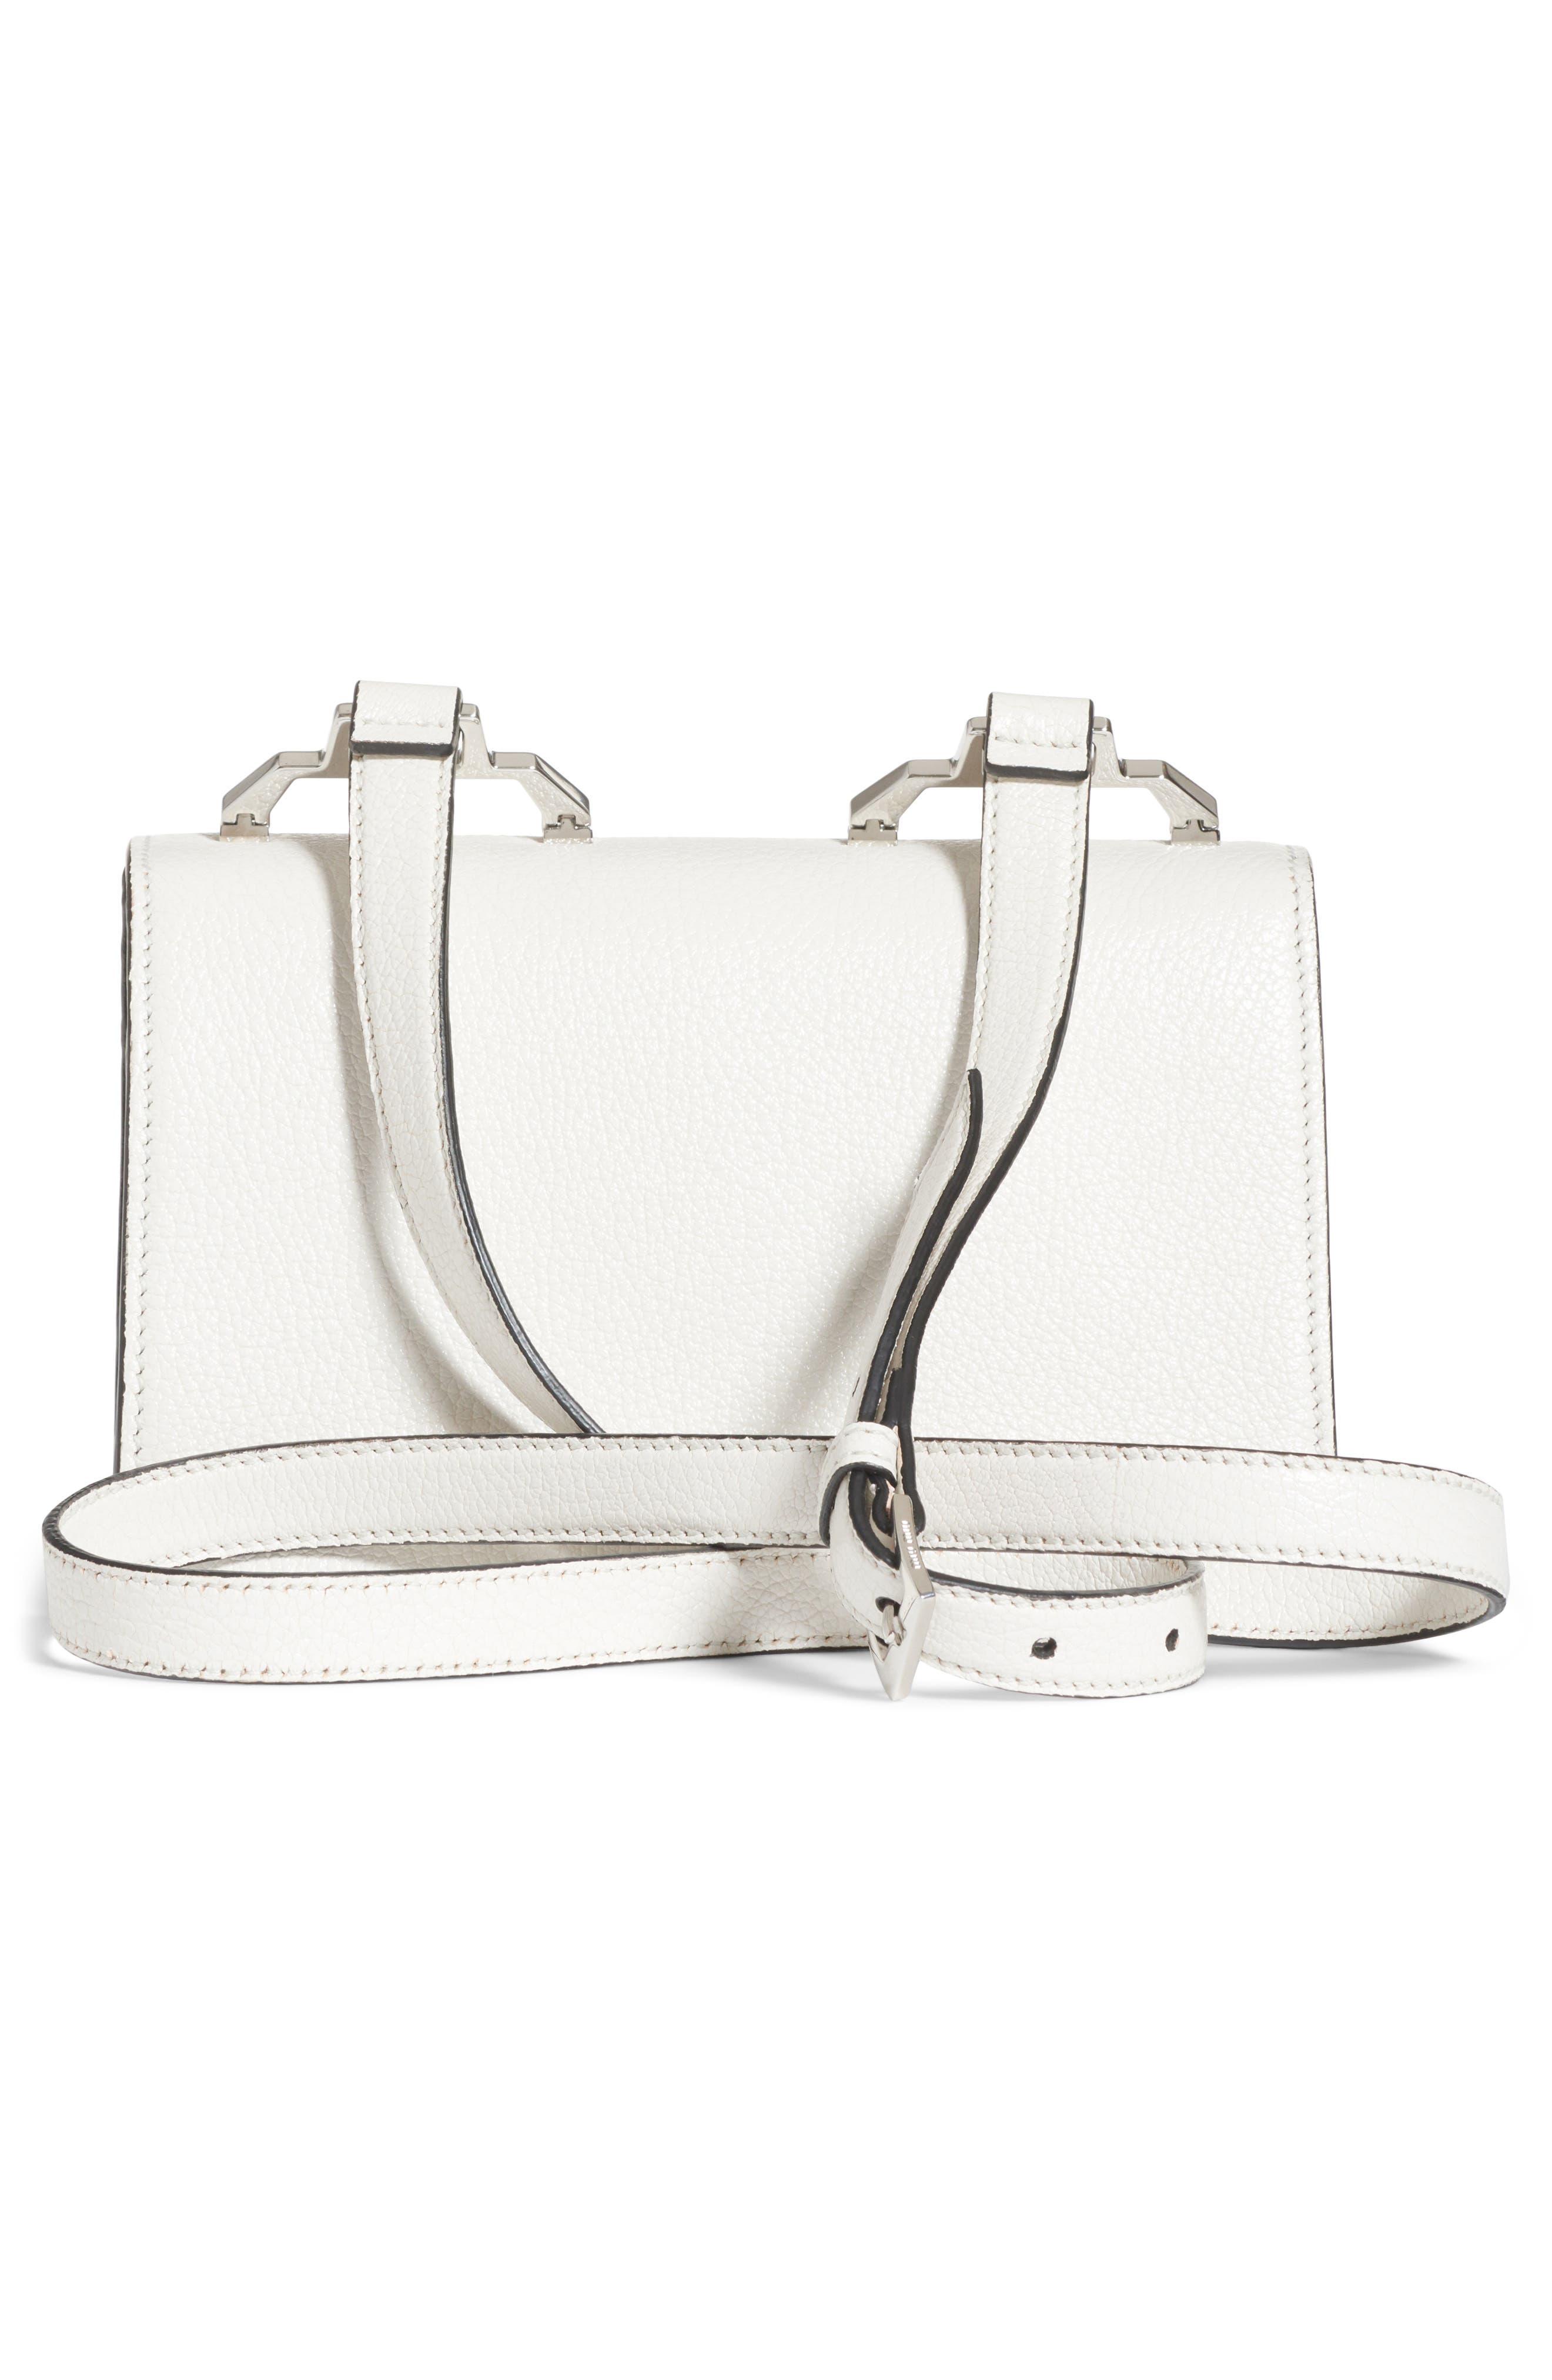 Leather Crossbody Bag,                             Alternate thumbnail 2, color,                             Bianco/ Baltico